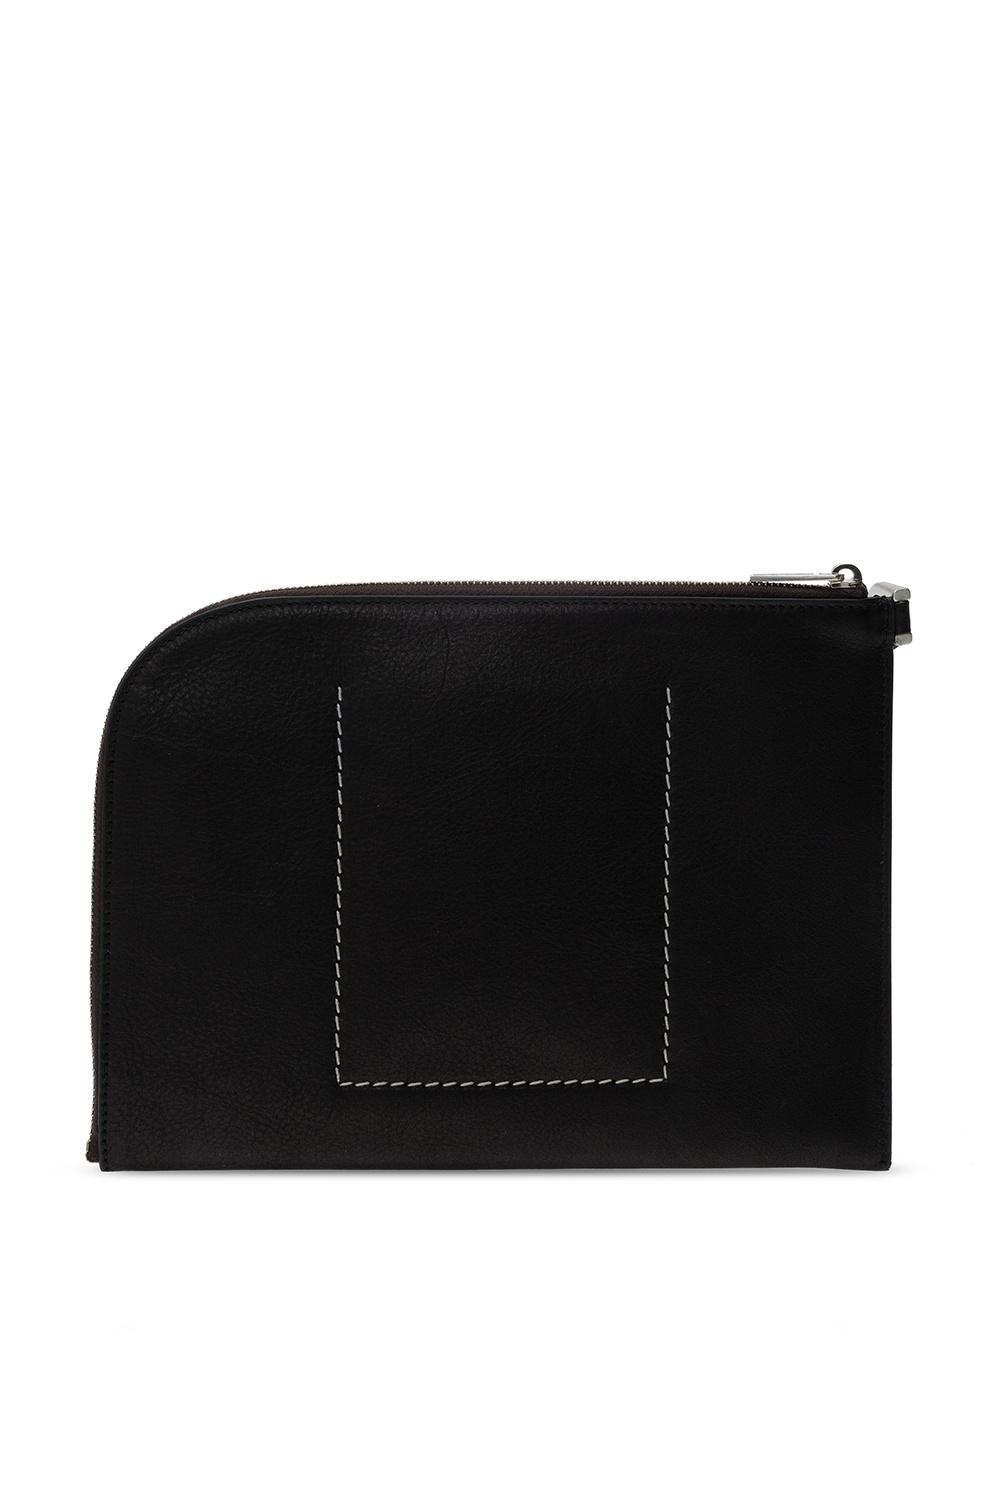 Rick Owens Leather handbag